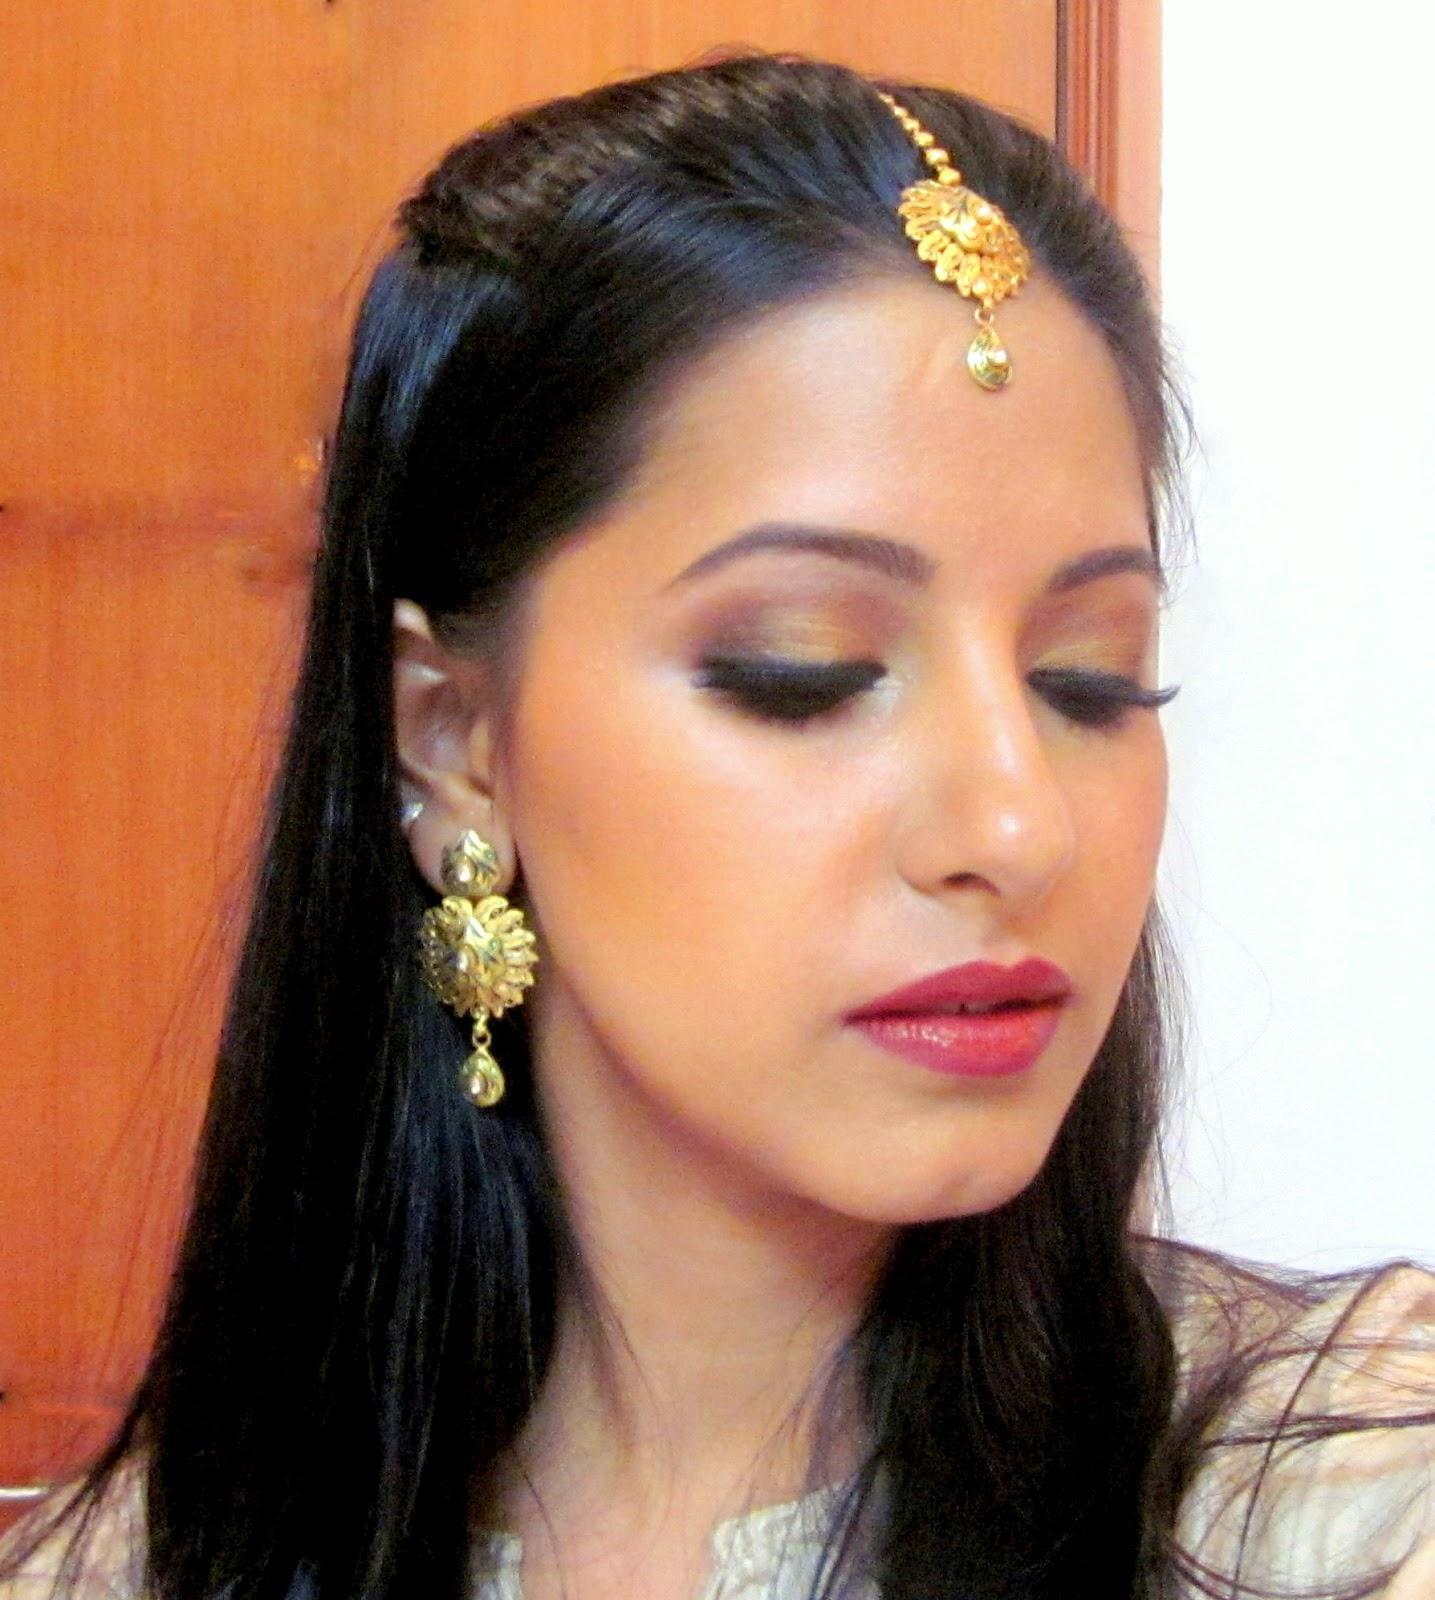 List Of Bridal Makeup : Product List for Indian Bridal Makeup Tutorial